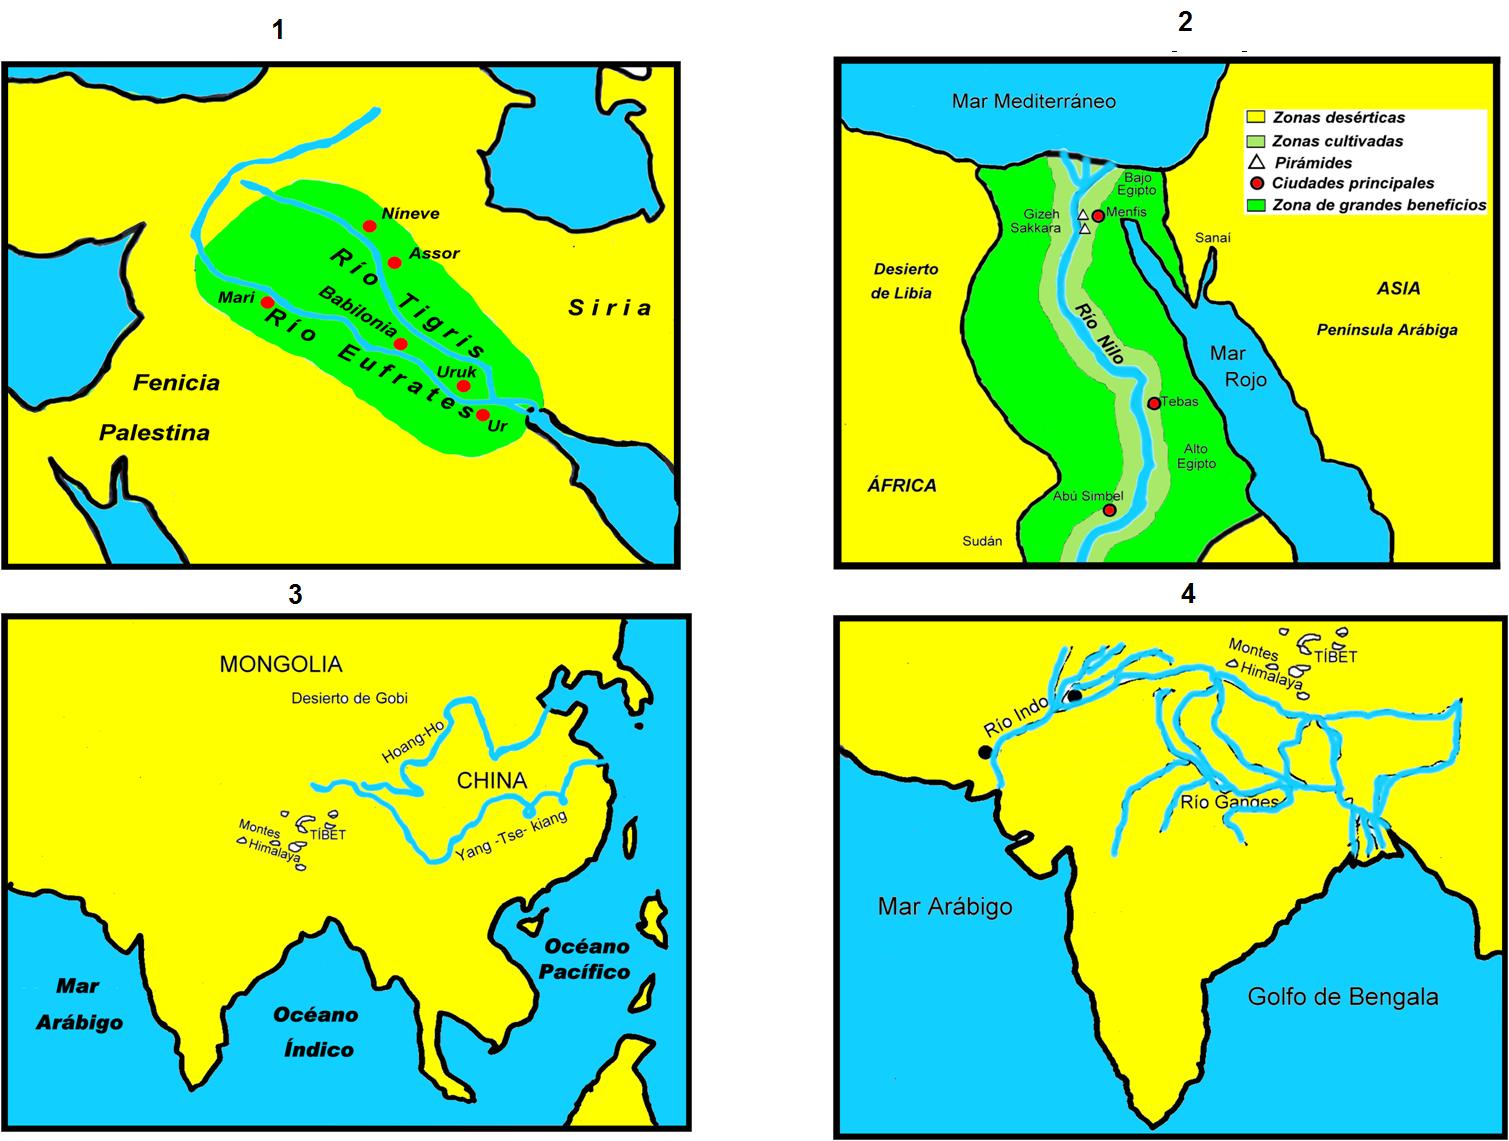 mesopotamia and china